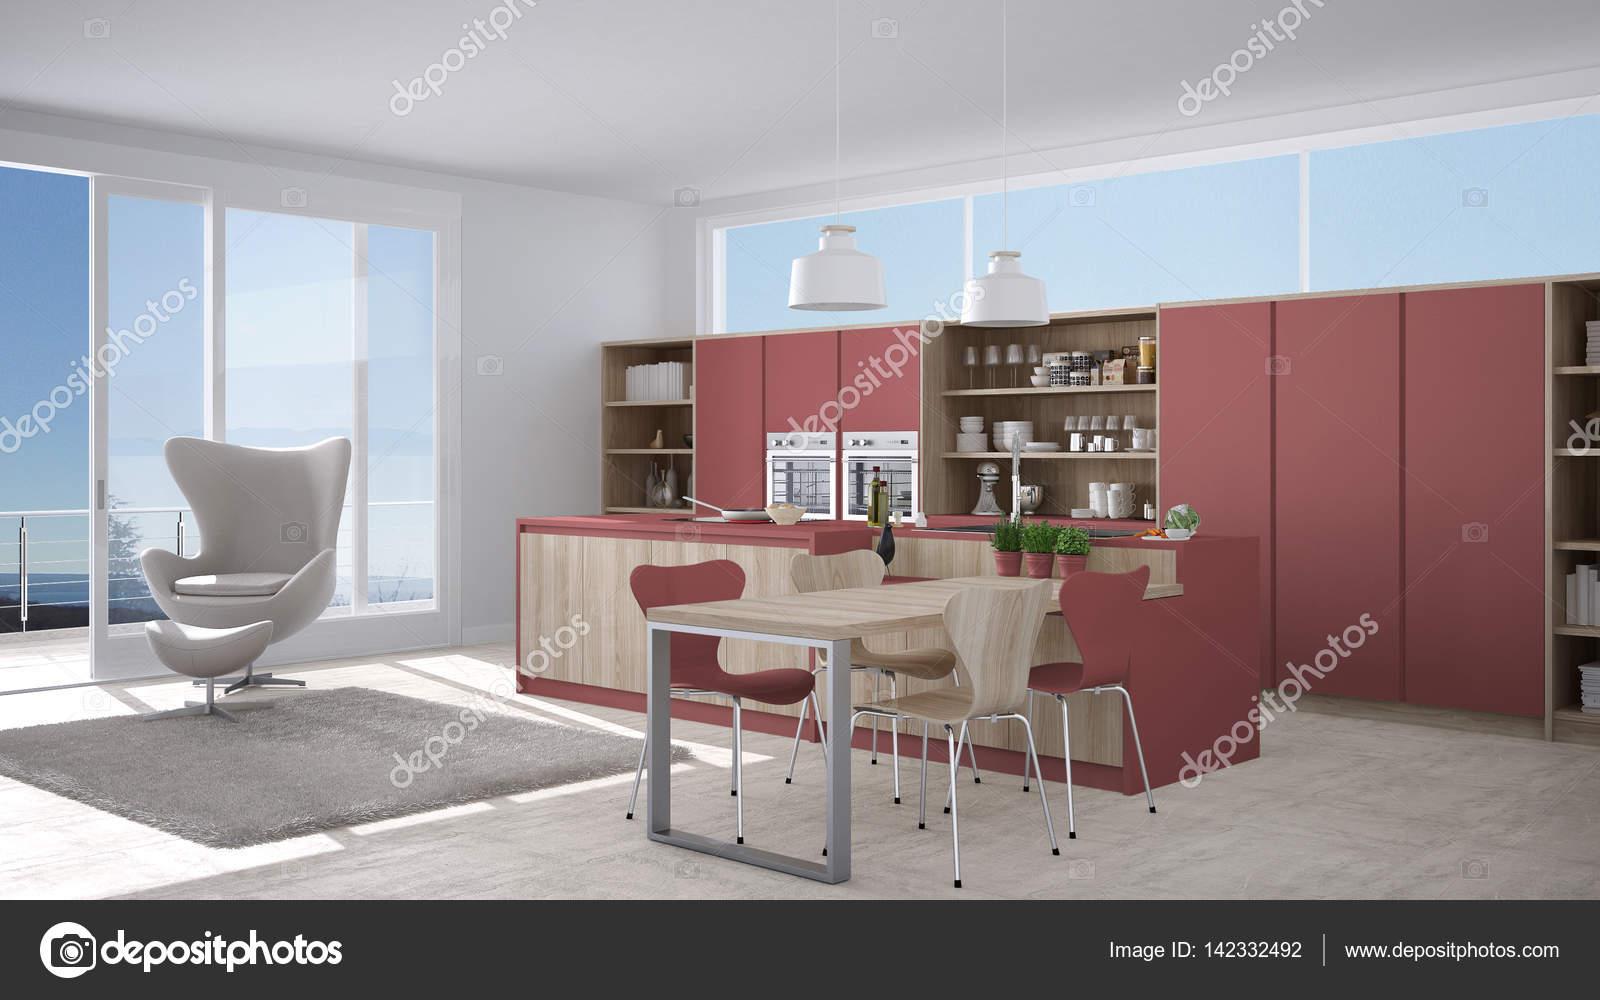 https://st3.depositphotos.com/1152281/14233/i/1600/depositphotos_142332492-stock-photo-modern-white-and-red-kitchen.jpg